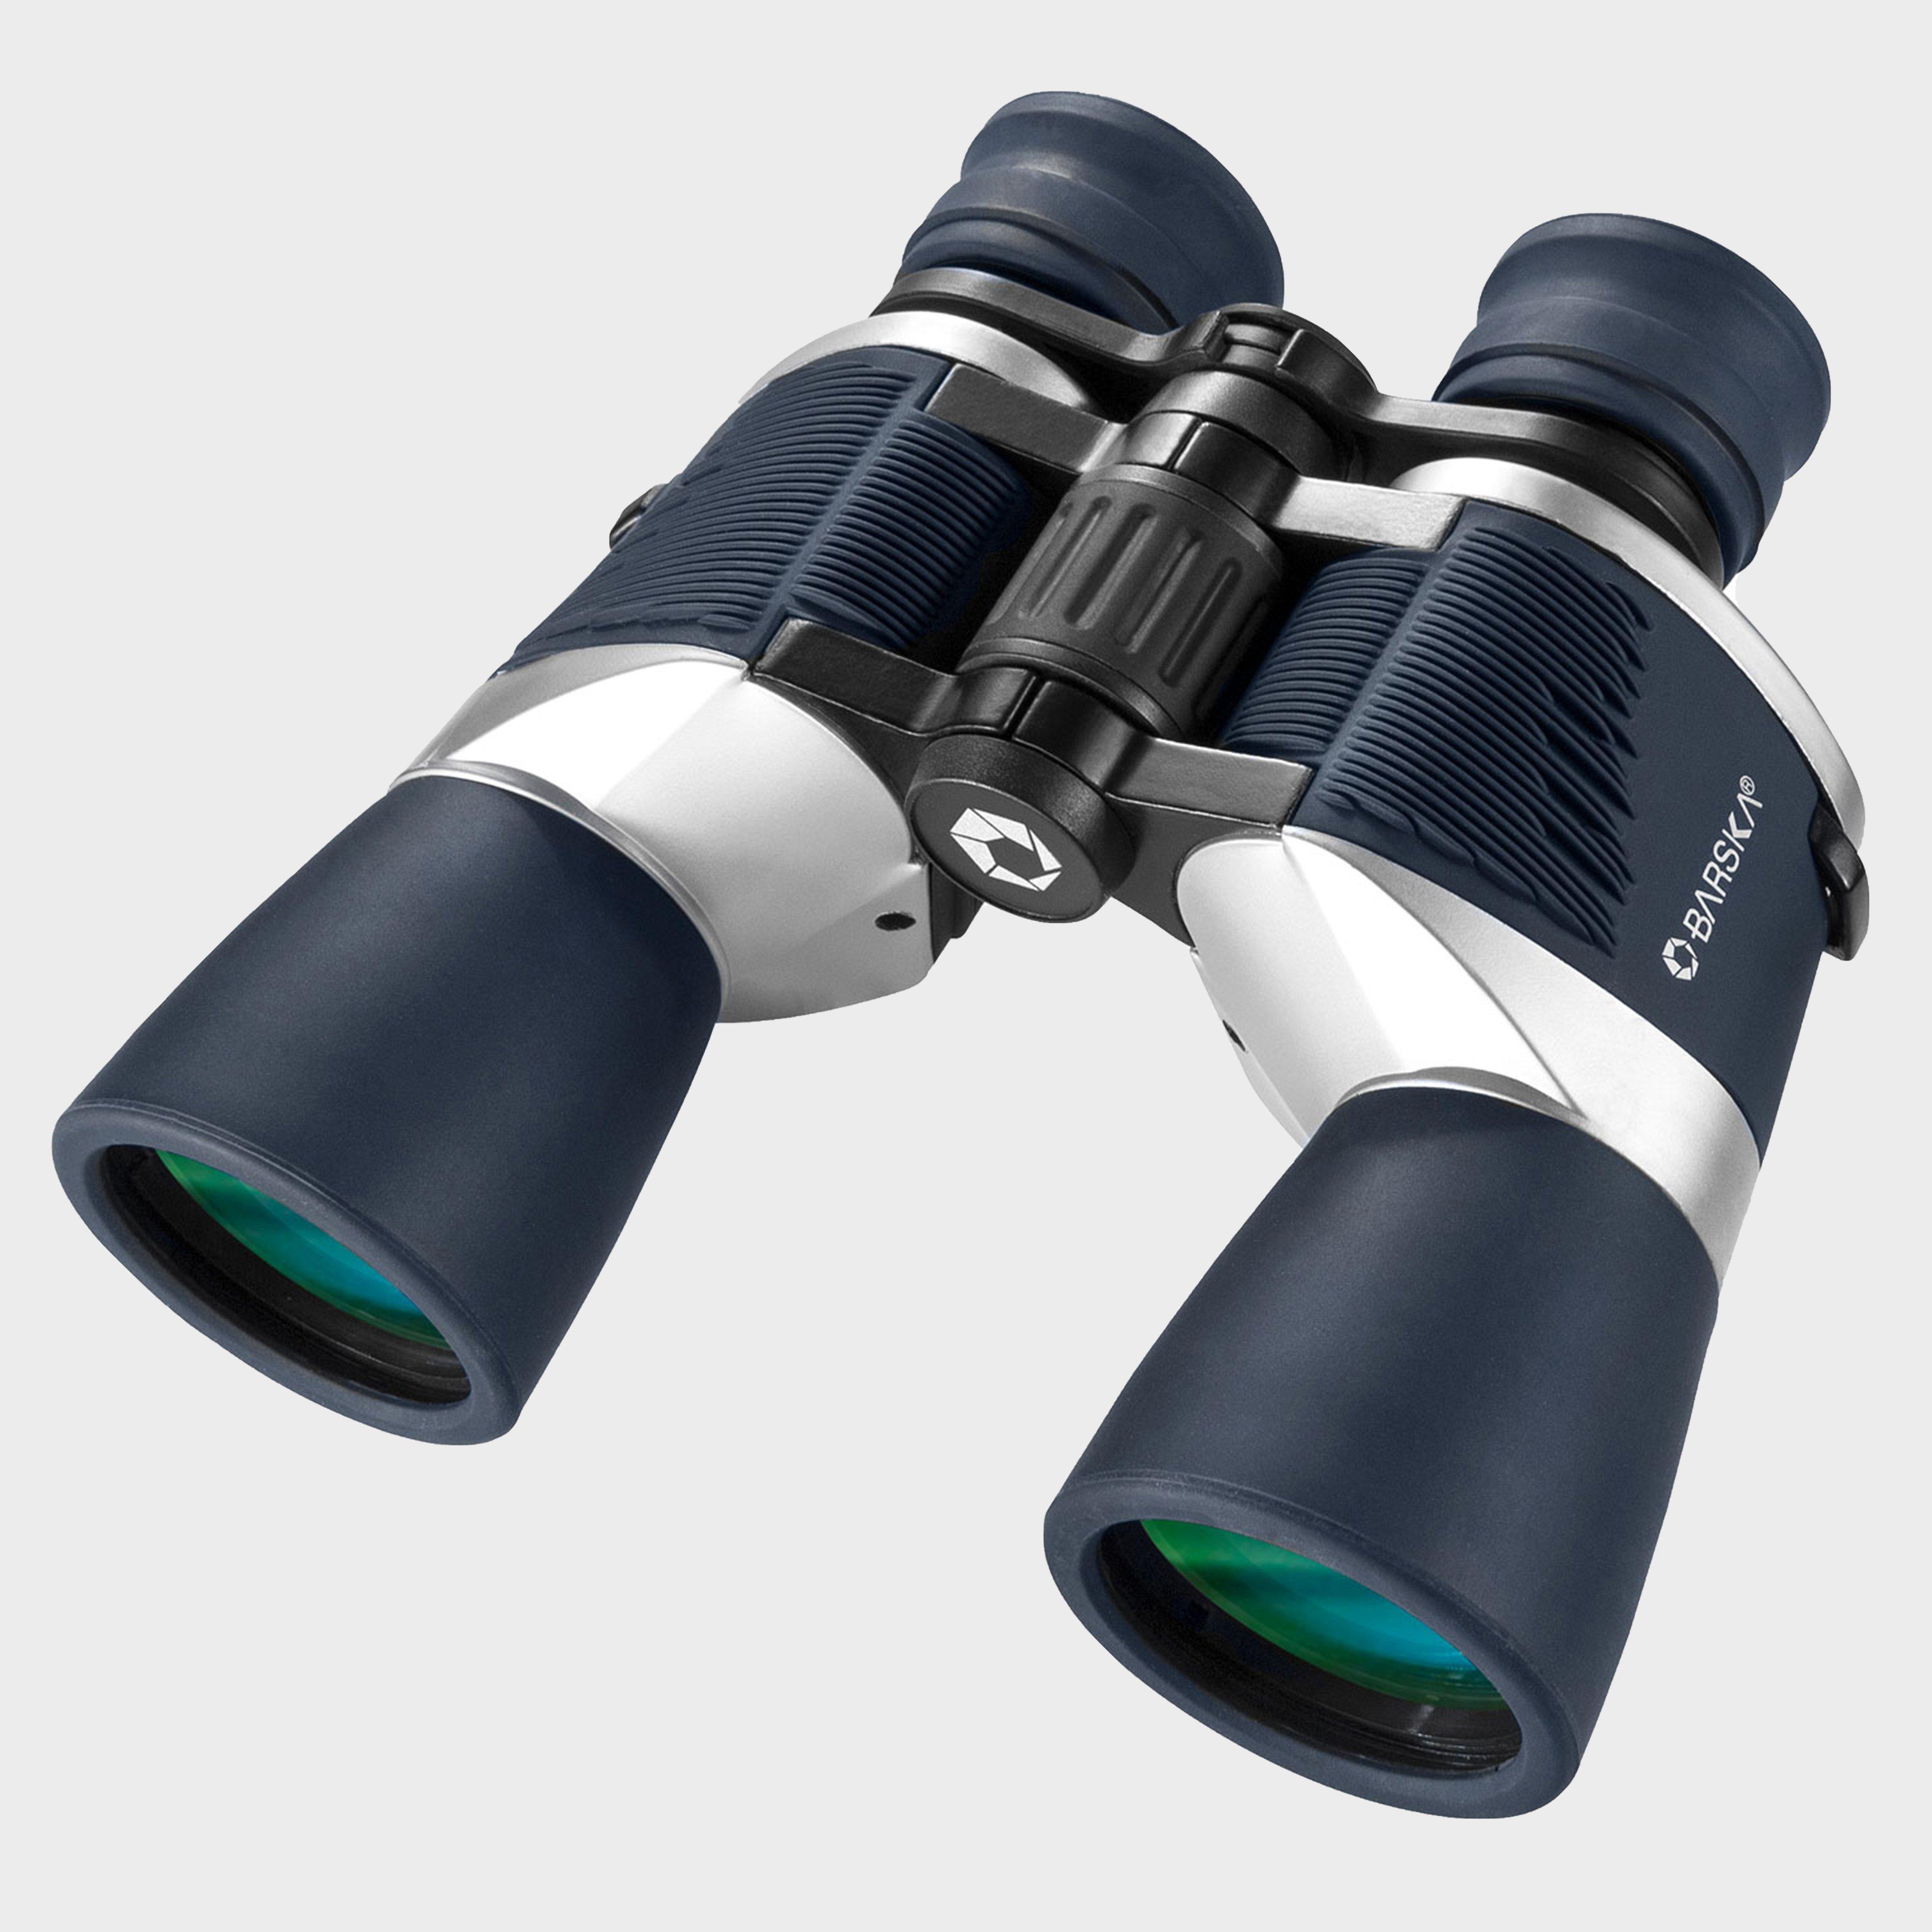 Barska Barska X-Treme View 10 x 50 Binoculars